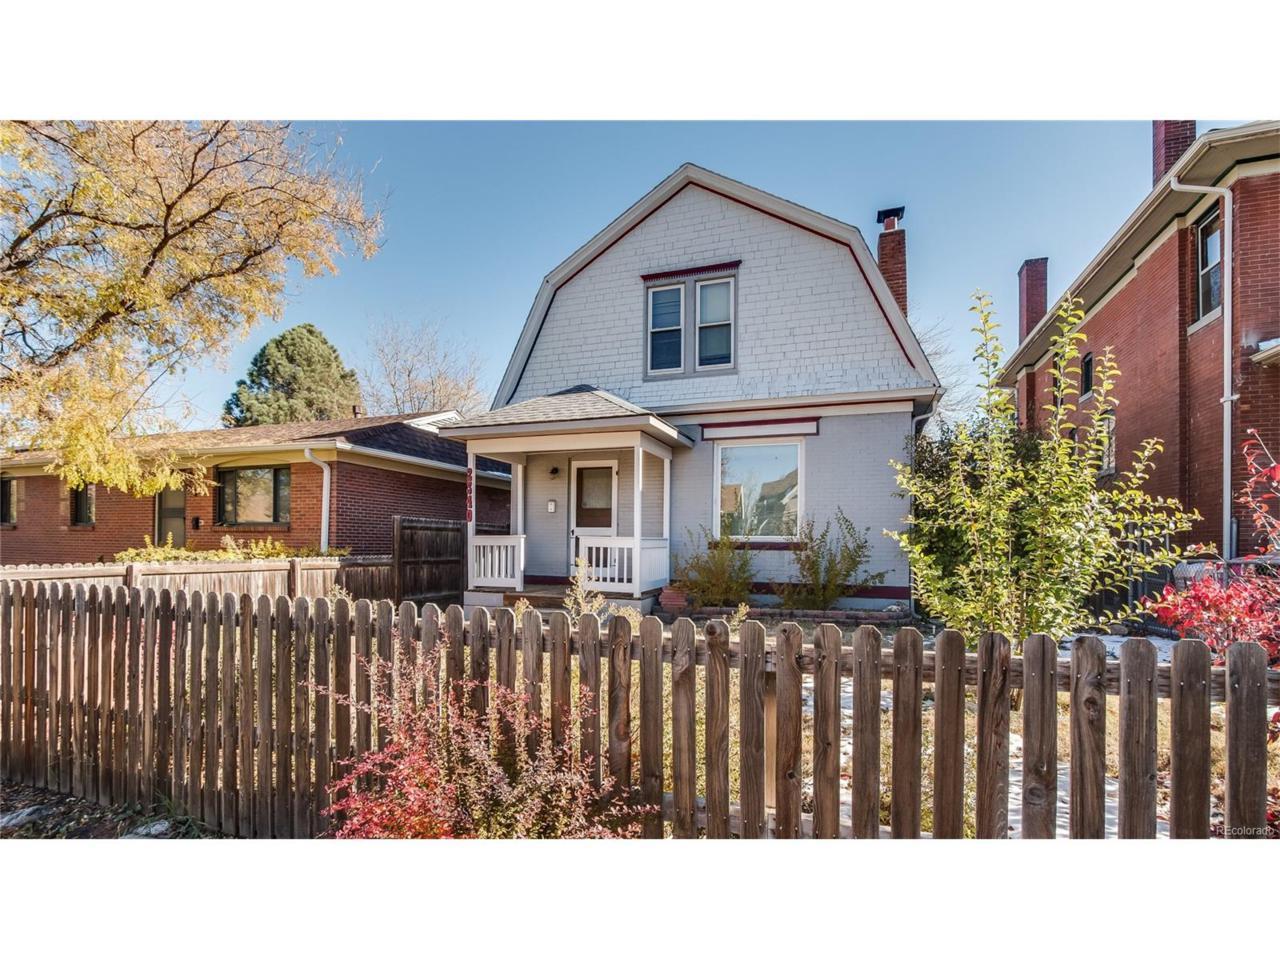 2340 N Vine Street, Denver, CO 80205 (MLS #2669244) :: 8z Real Estate